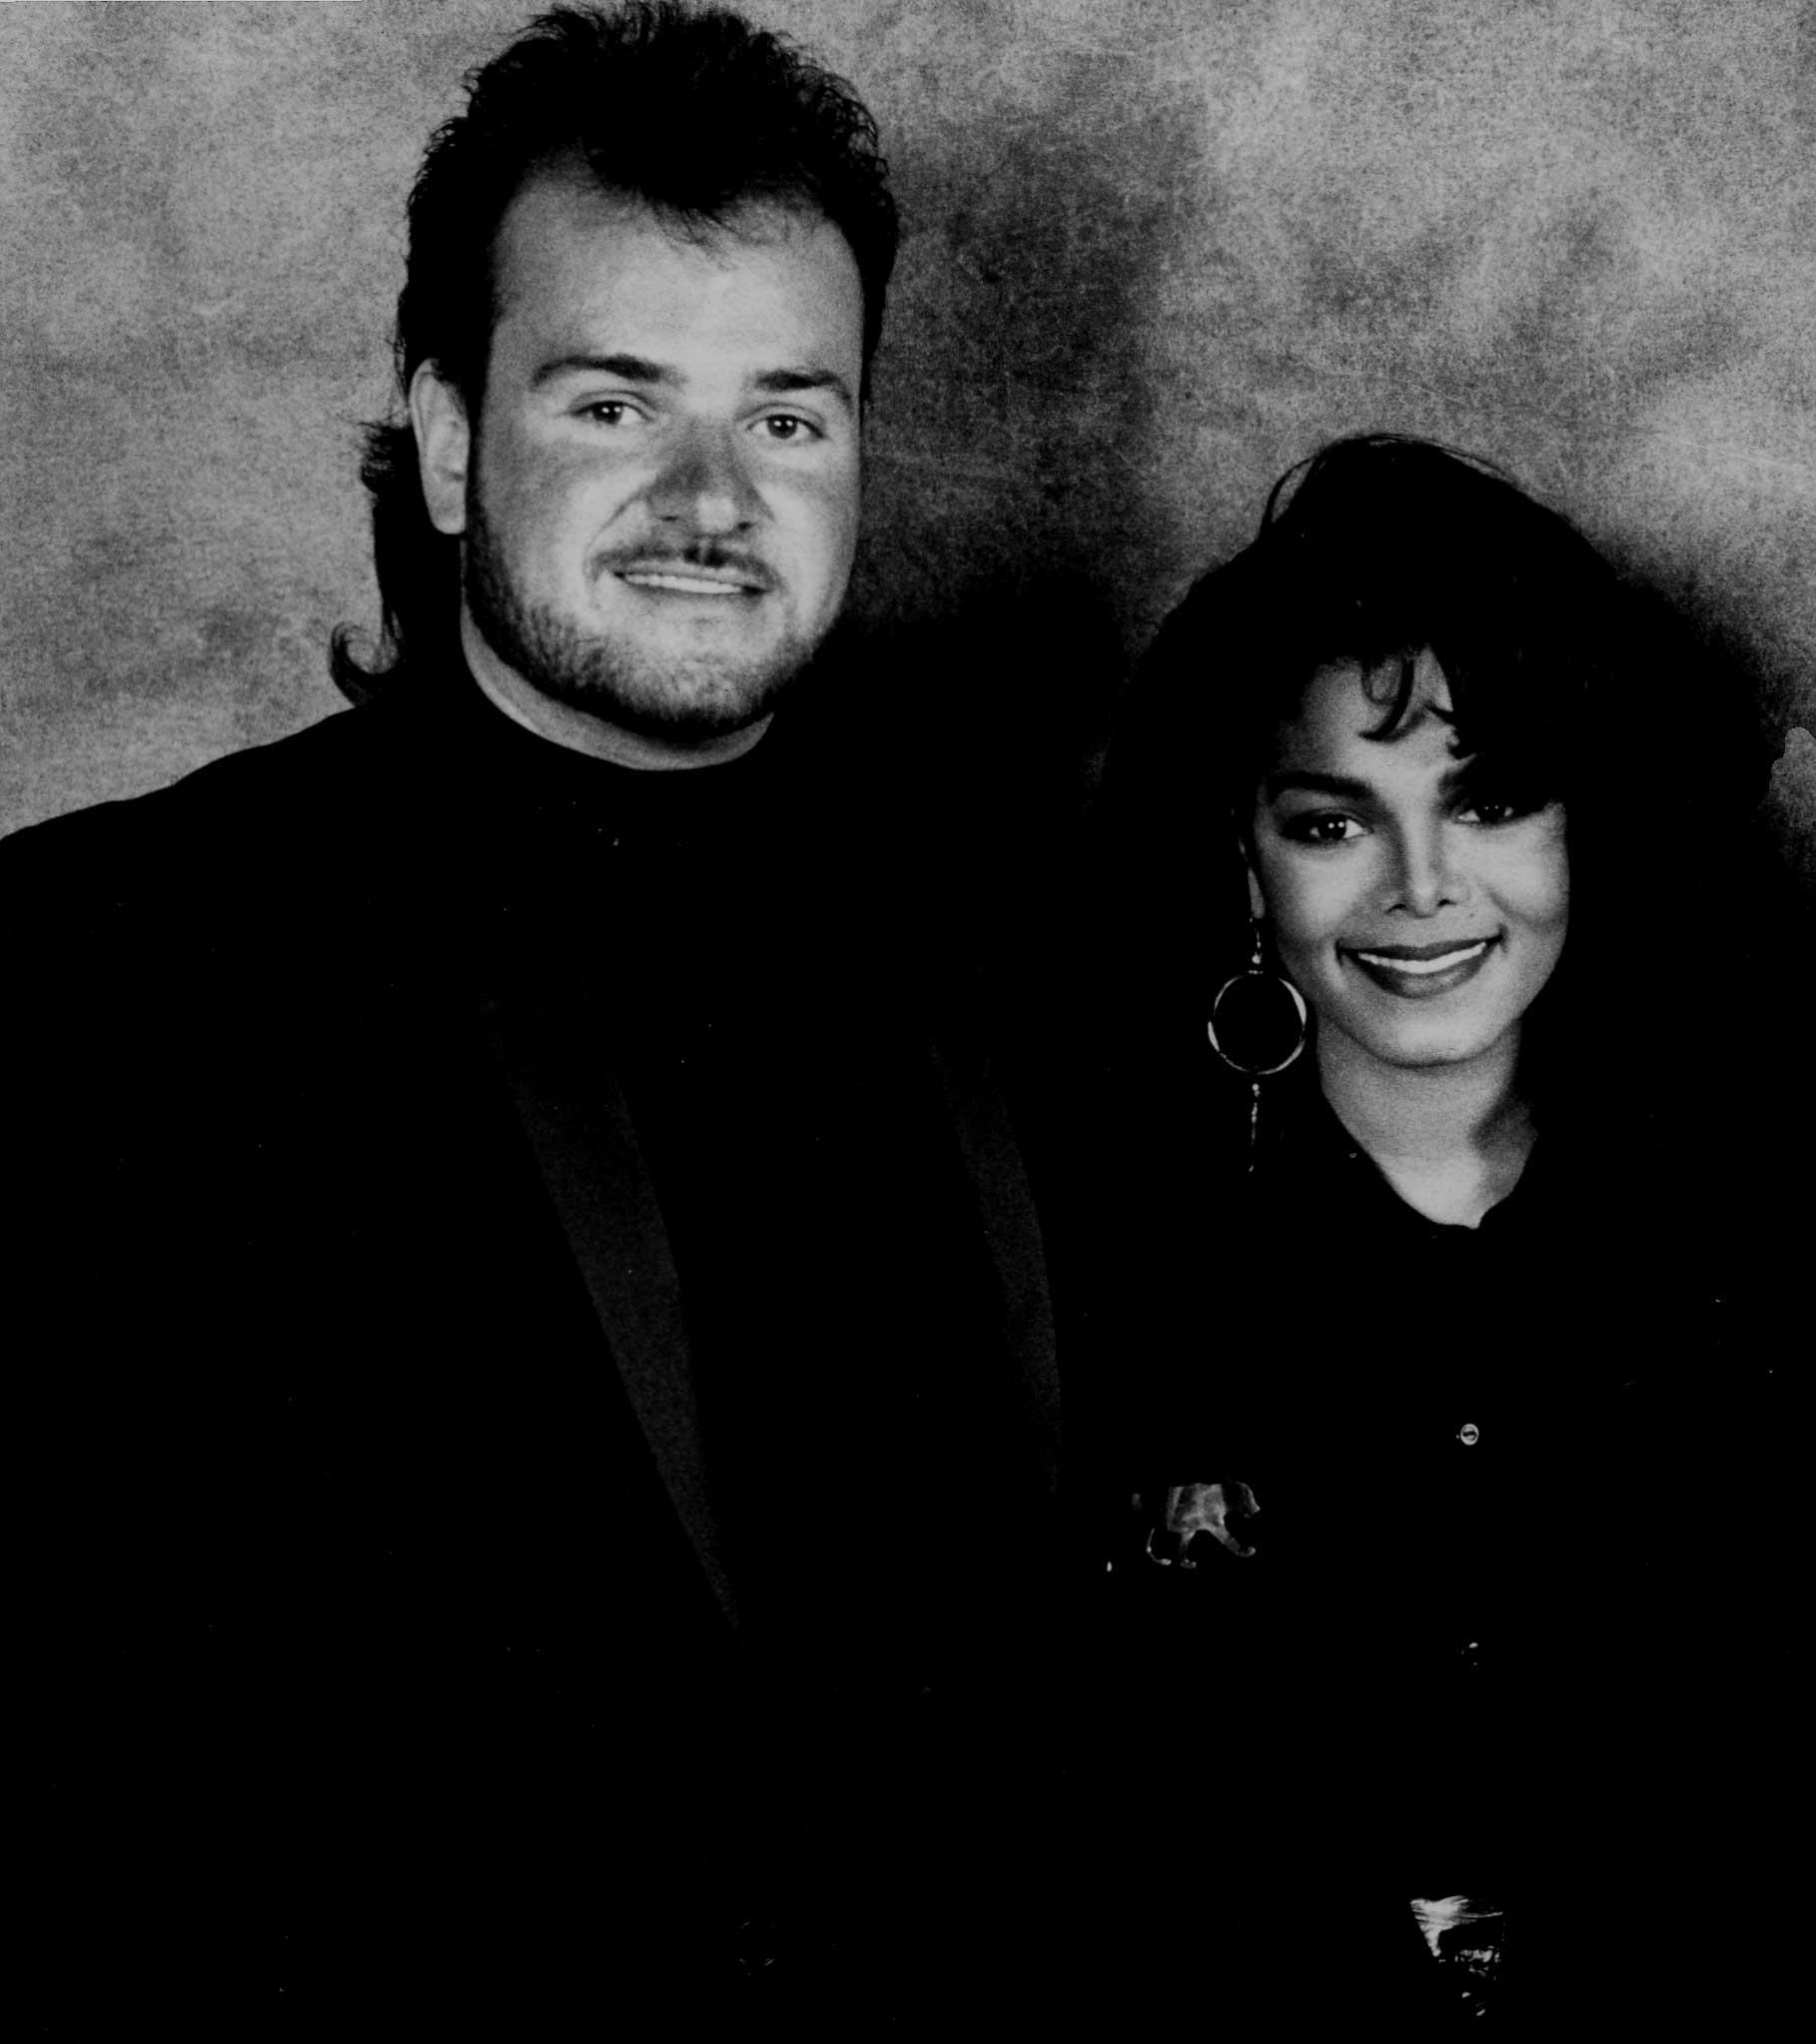 Steve ~ Janet Jackson